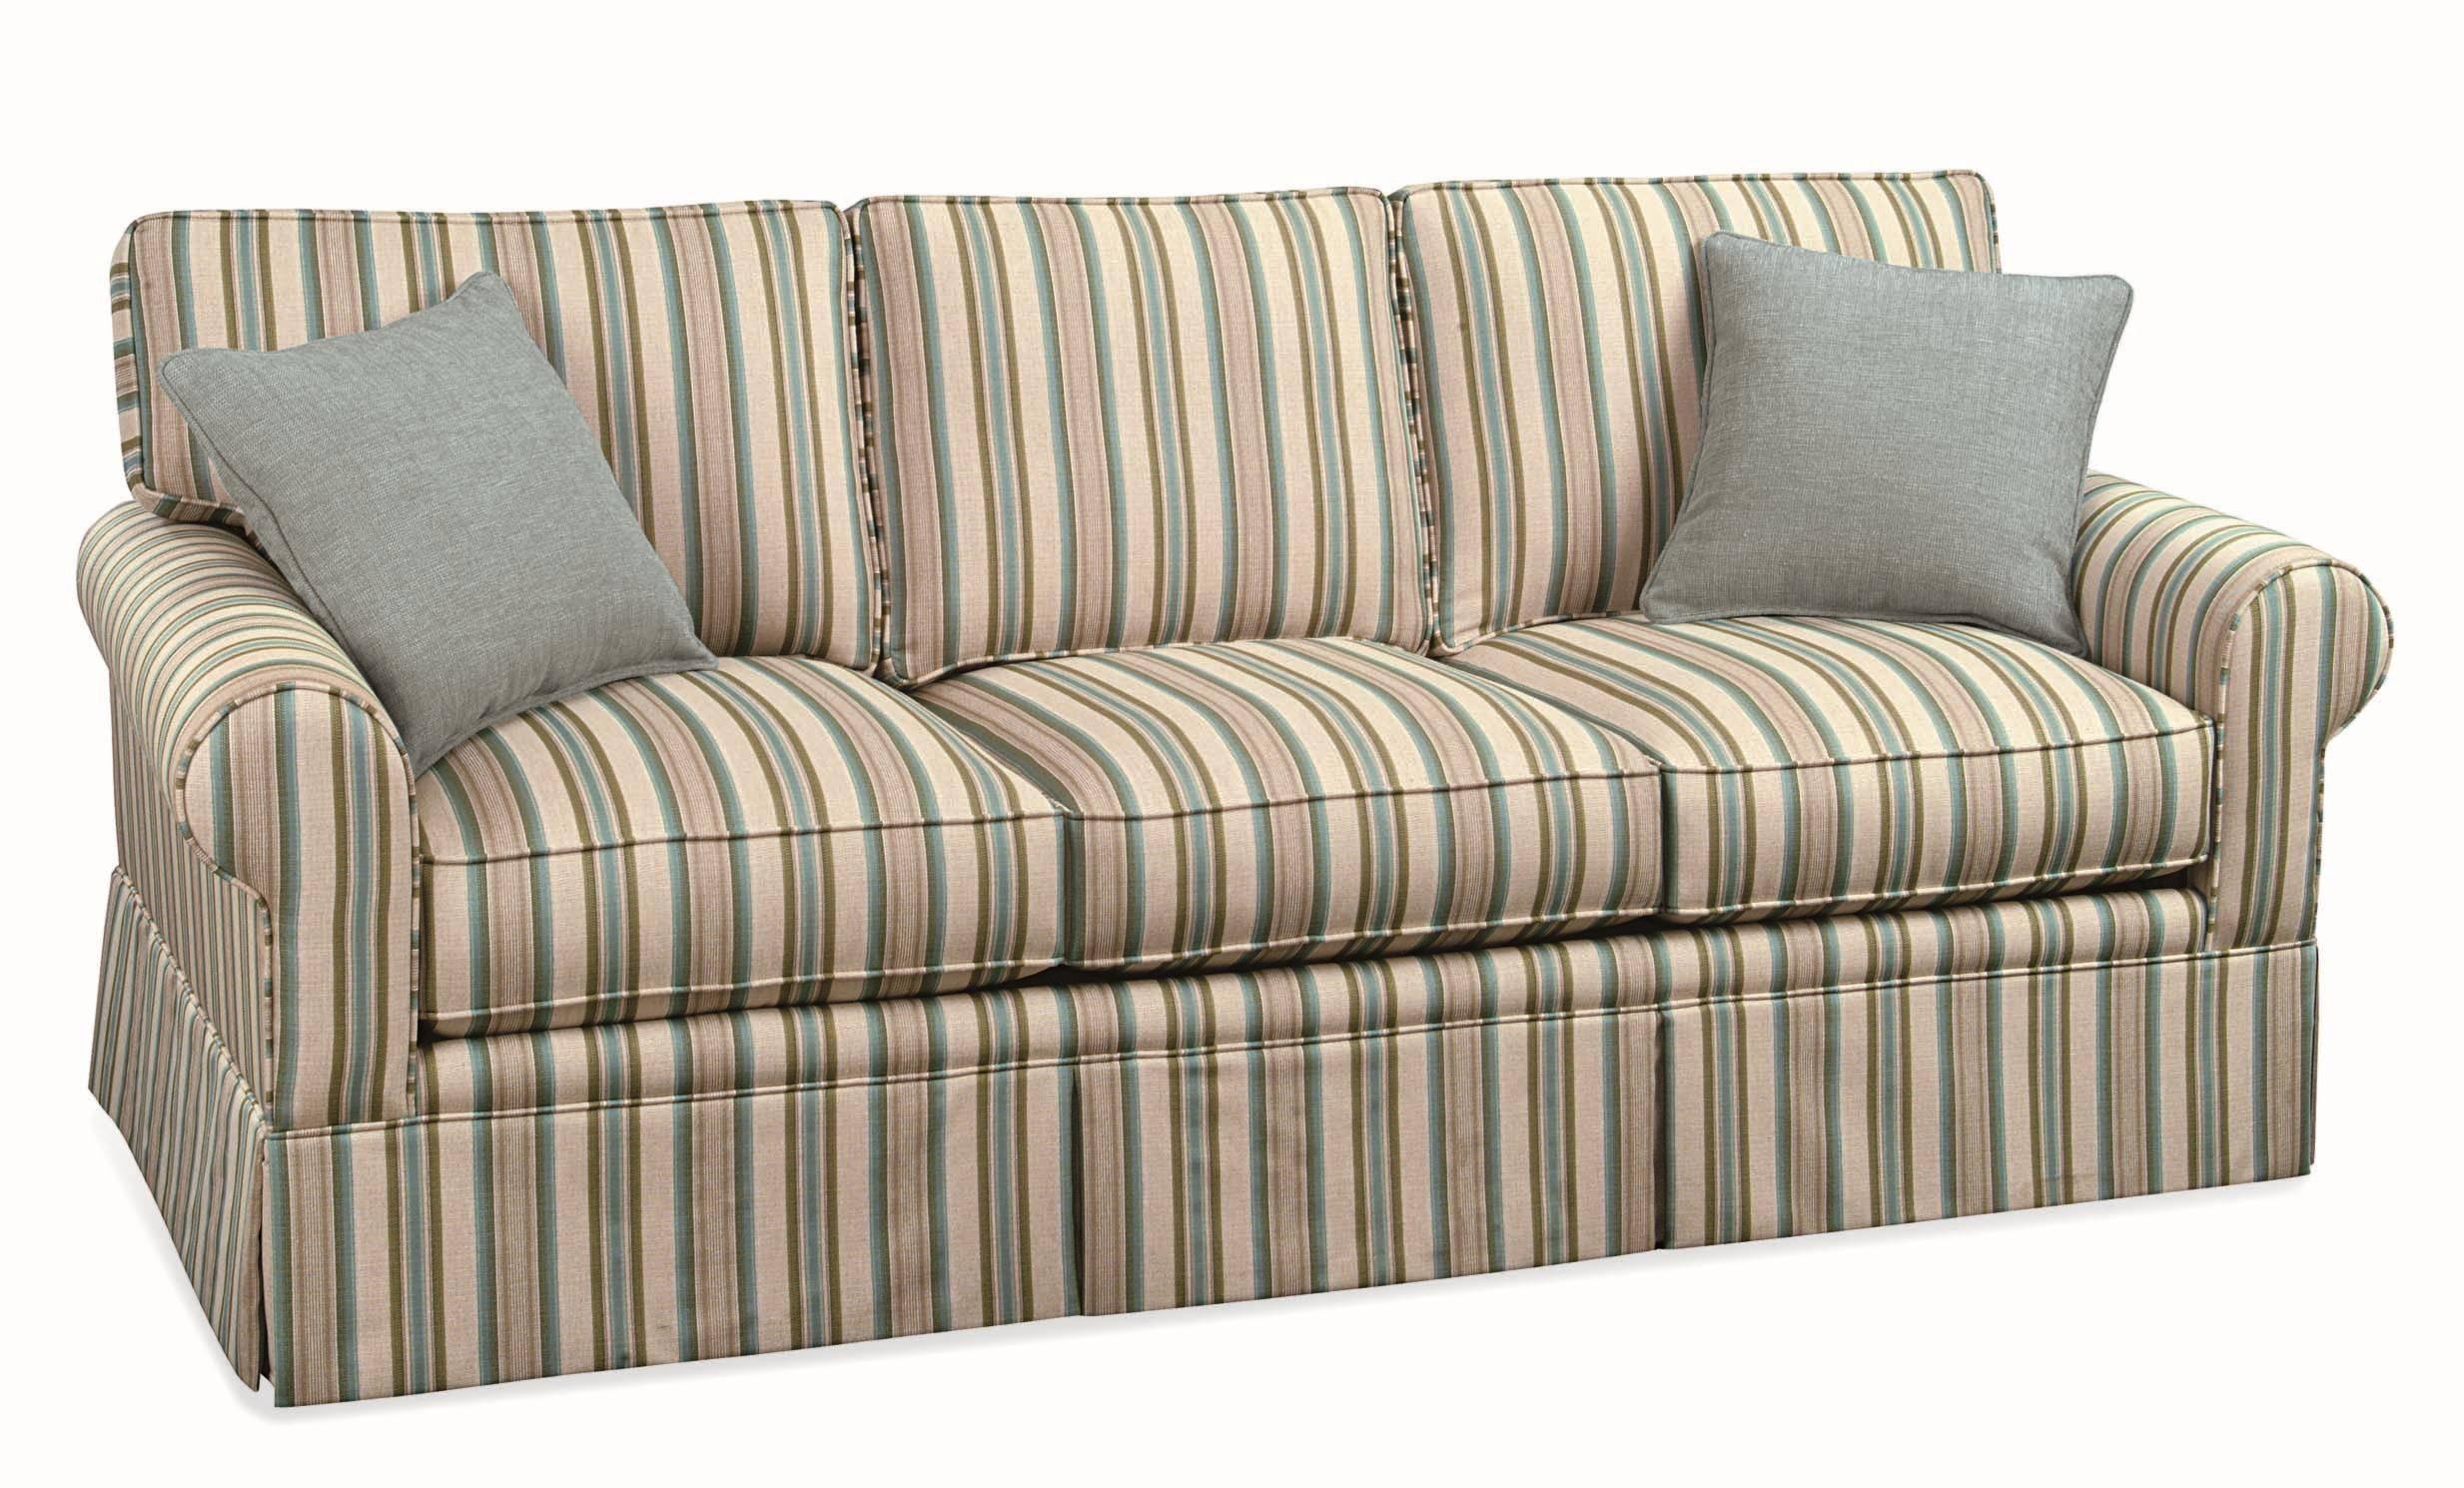 Braxton Culler Sofas & Accent Sofas Store - Dealer Locator regarding Braxton Sofa (Image 4 of 30)